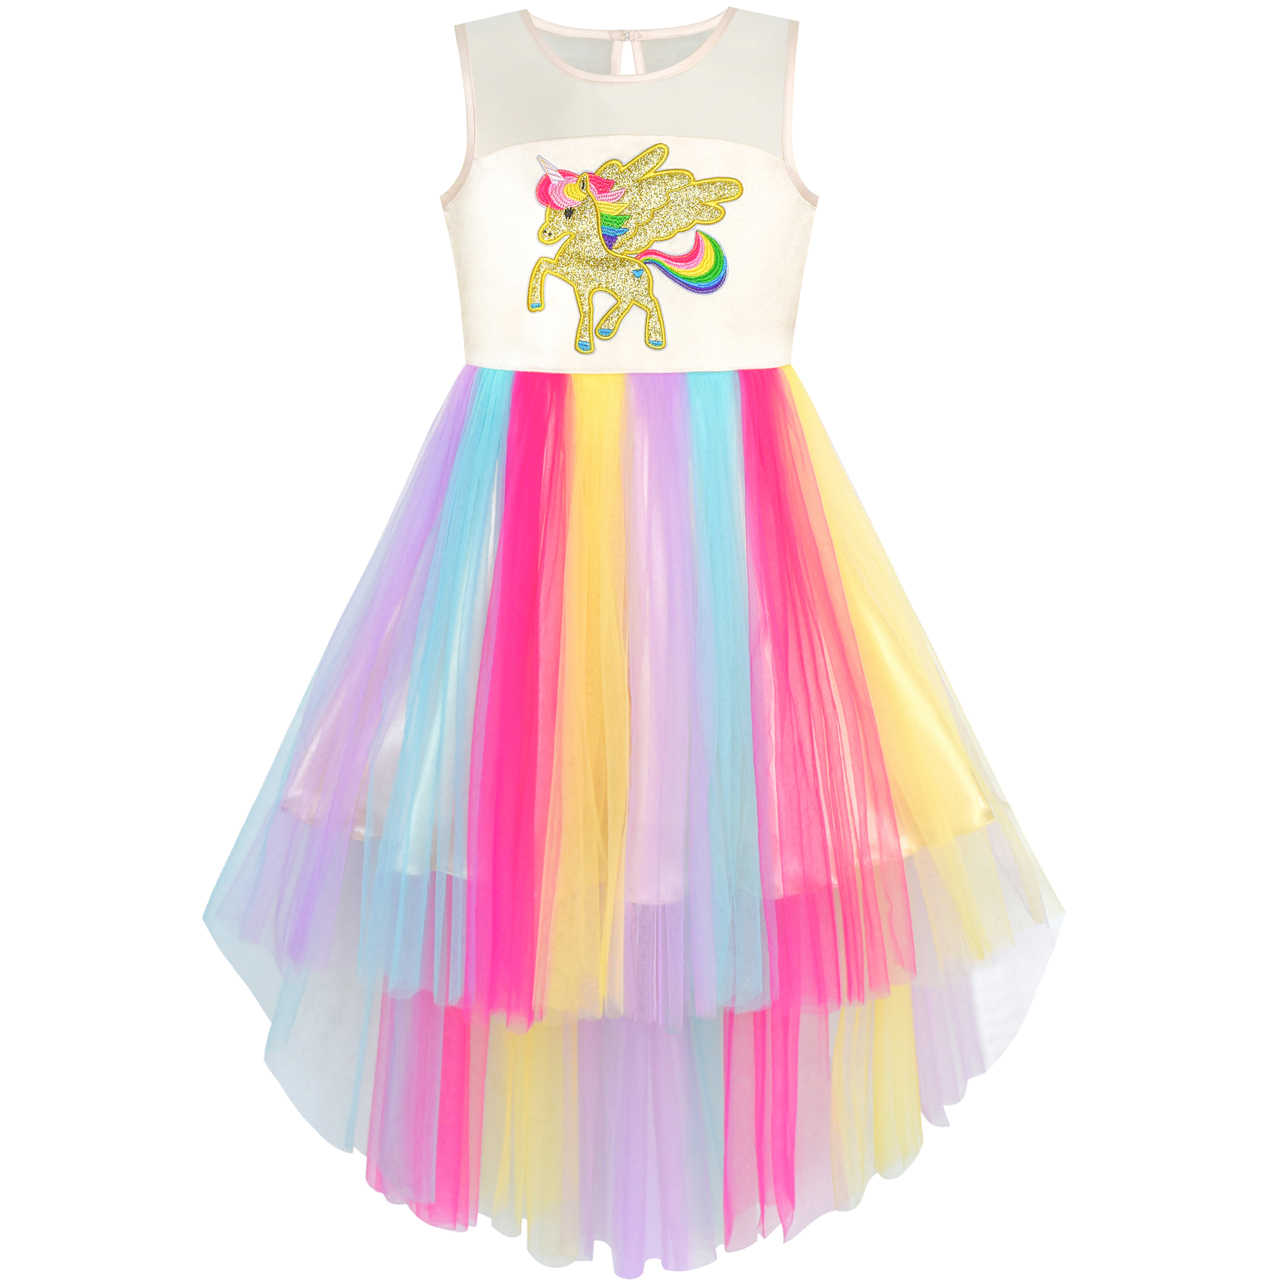 8493a34f5eab5 Girls Dress Embroidered Unicorn Rainbow Halloween Costume 2019 ...